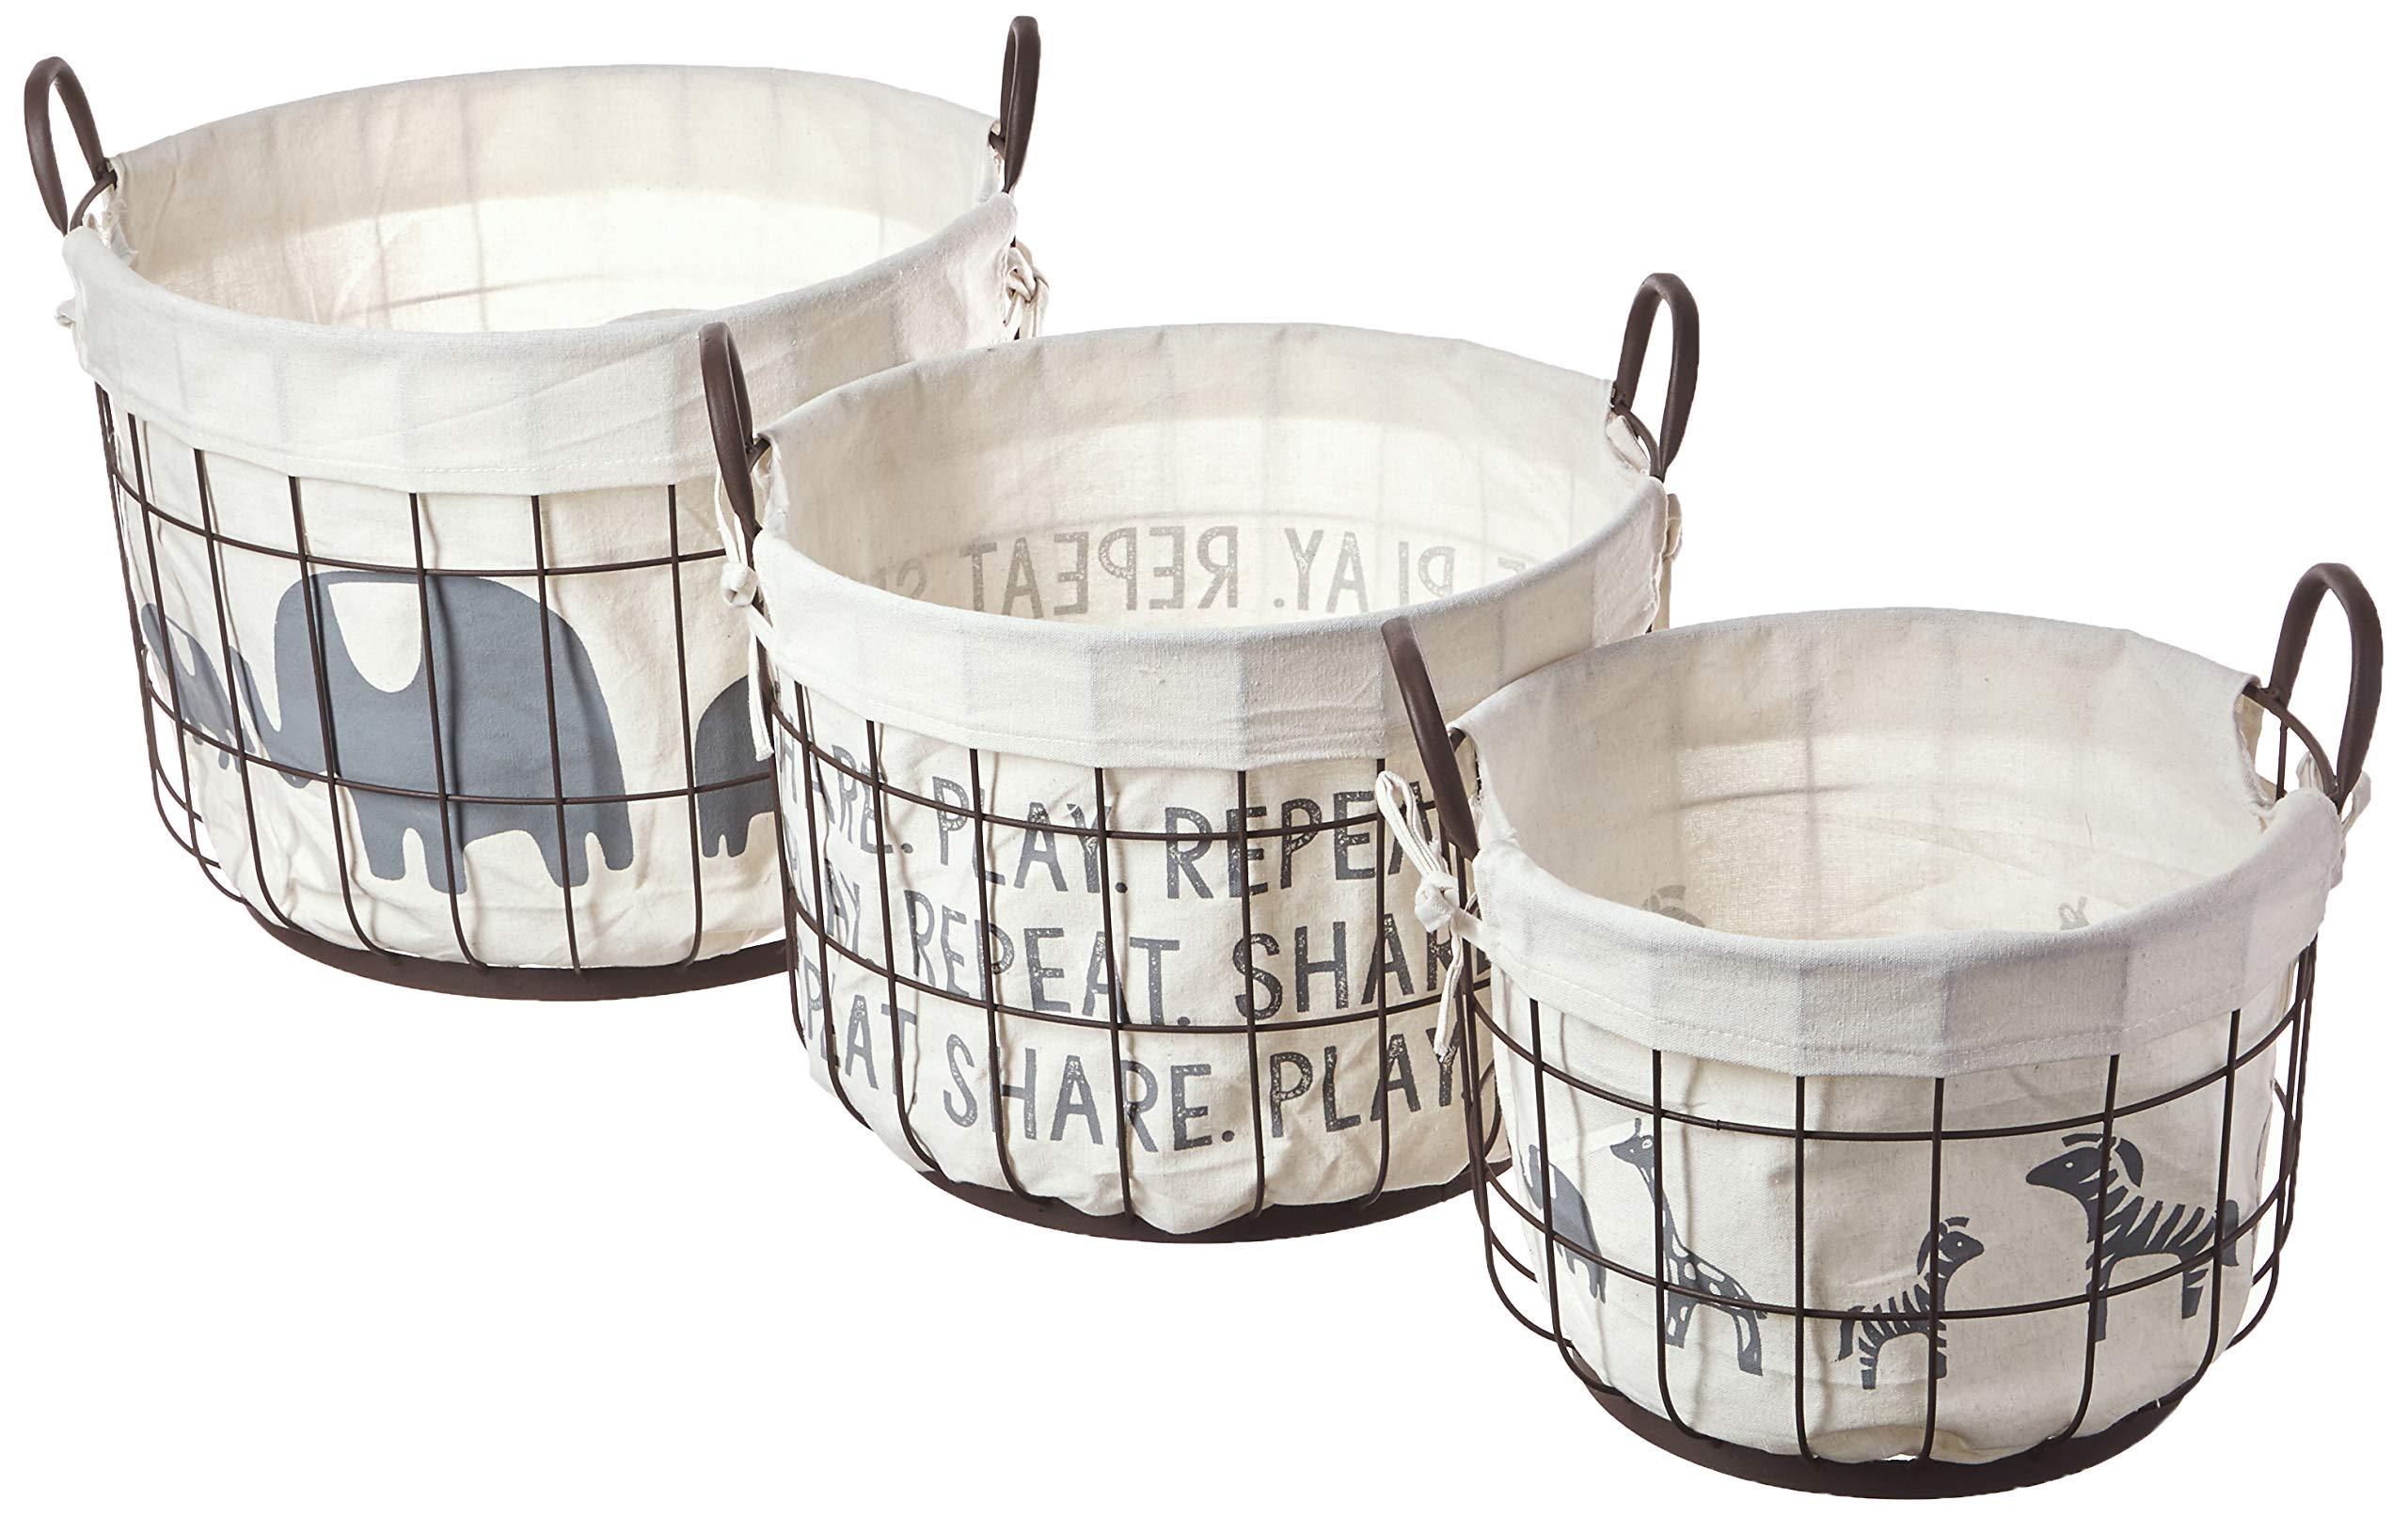 Mud Pie Rustic Vintage Inspired Nesting Set of 3 Storage Baskets Nursery Decor, Off White by Mud Pie